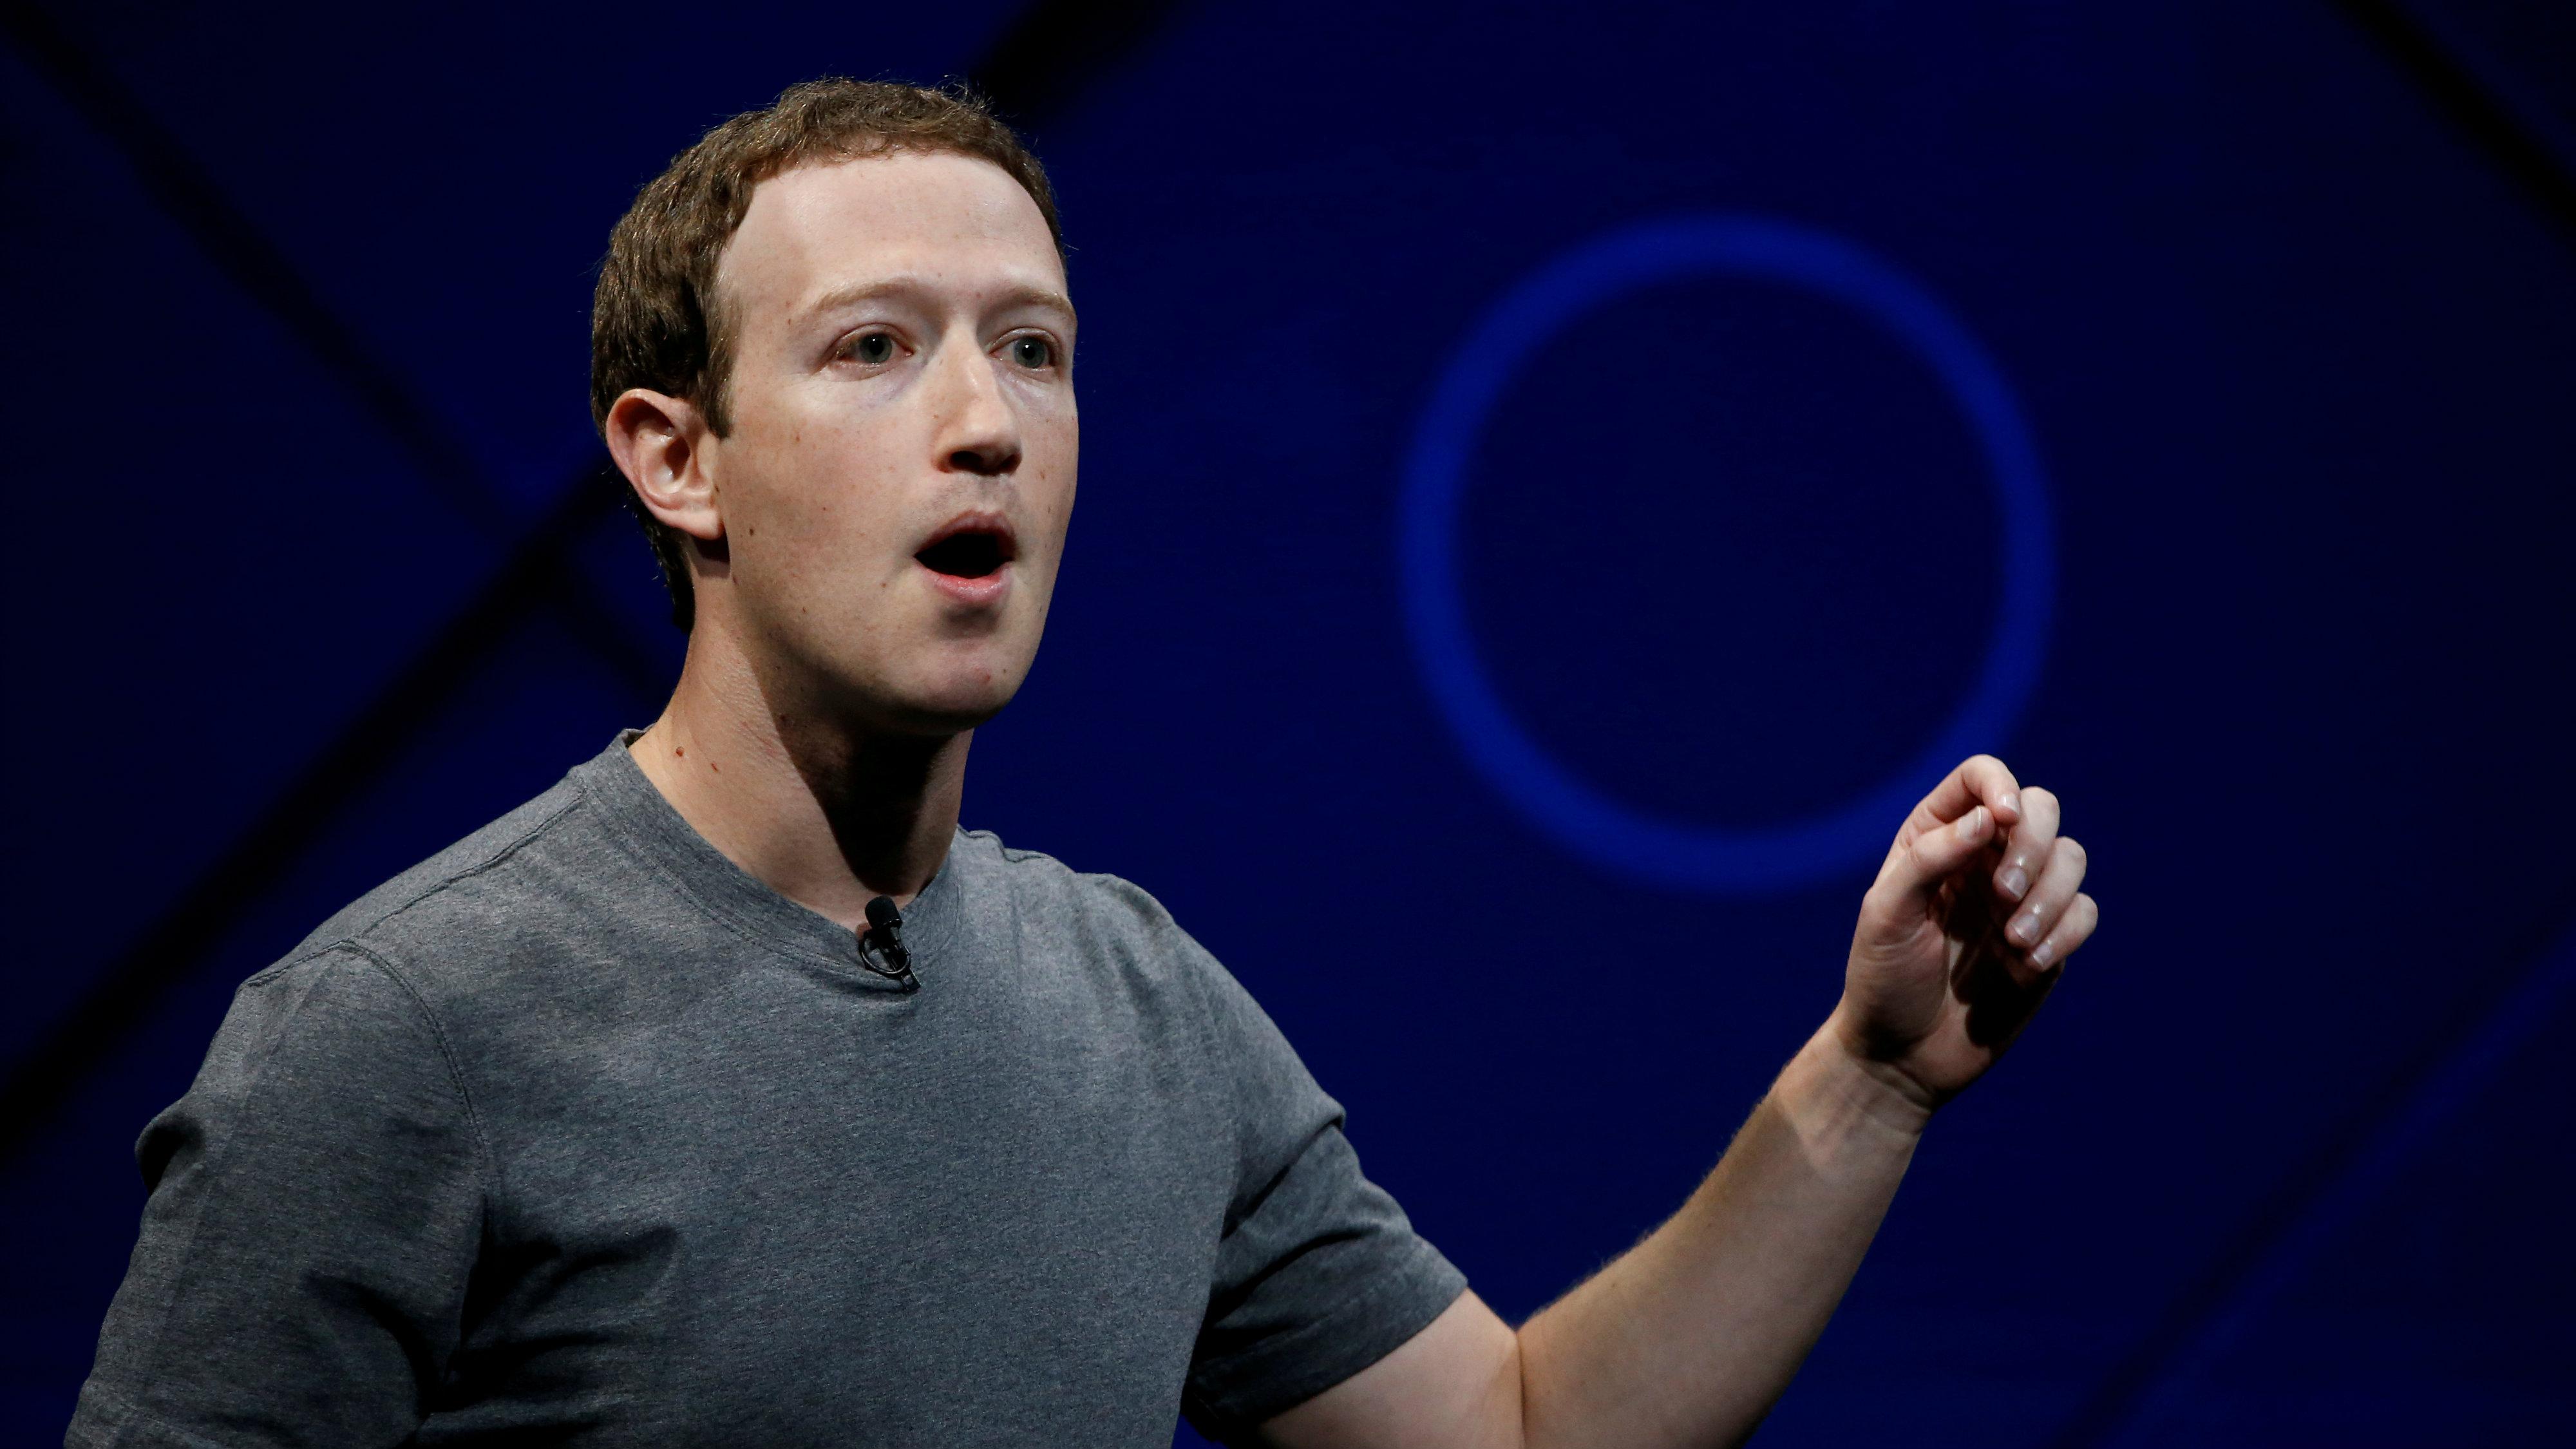 Mark Zuckerberg responds to Cambridge Analytica scandal